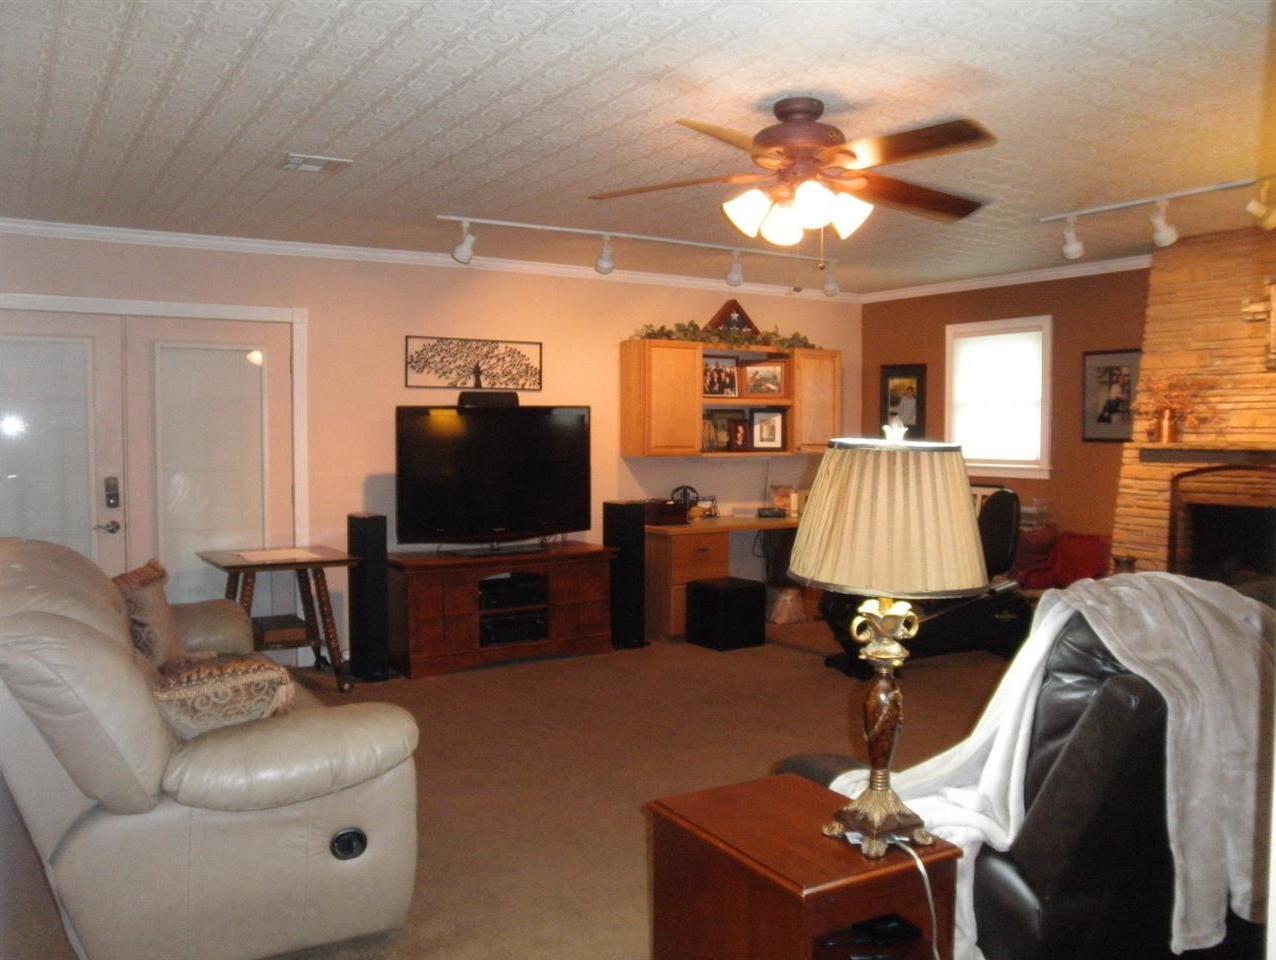 Sold Cross Sale W/ MLS | 127 Fairview  Ponca City, OK 74601 19